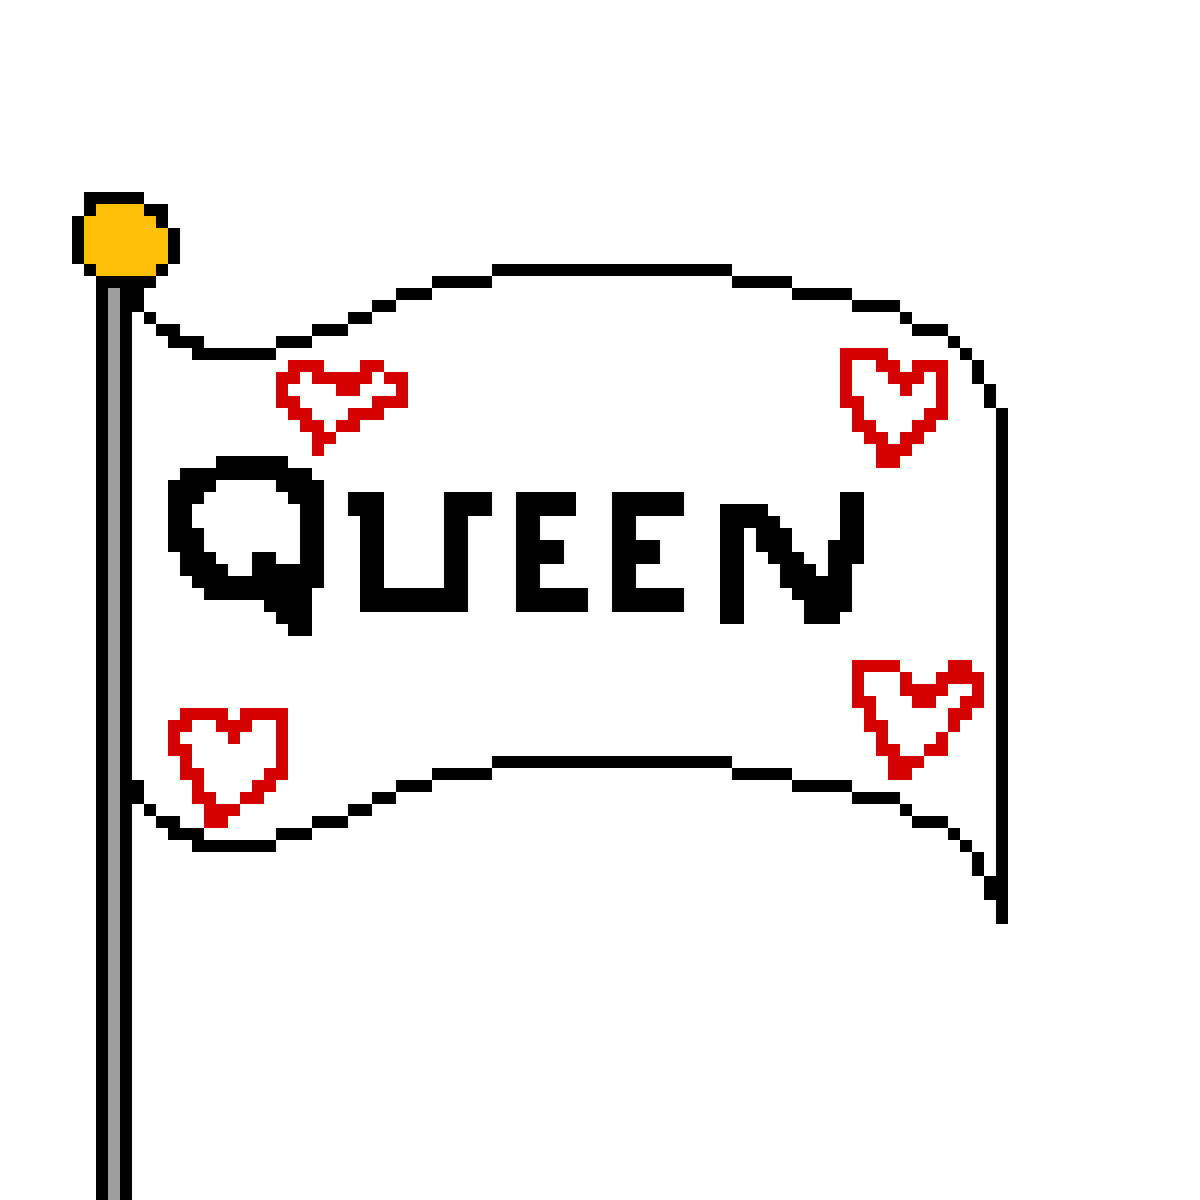 main-image-Queen:)  by bohemianl0ser